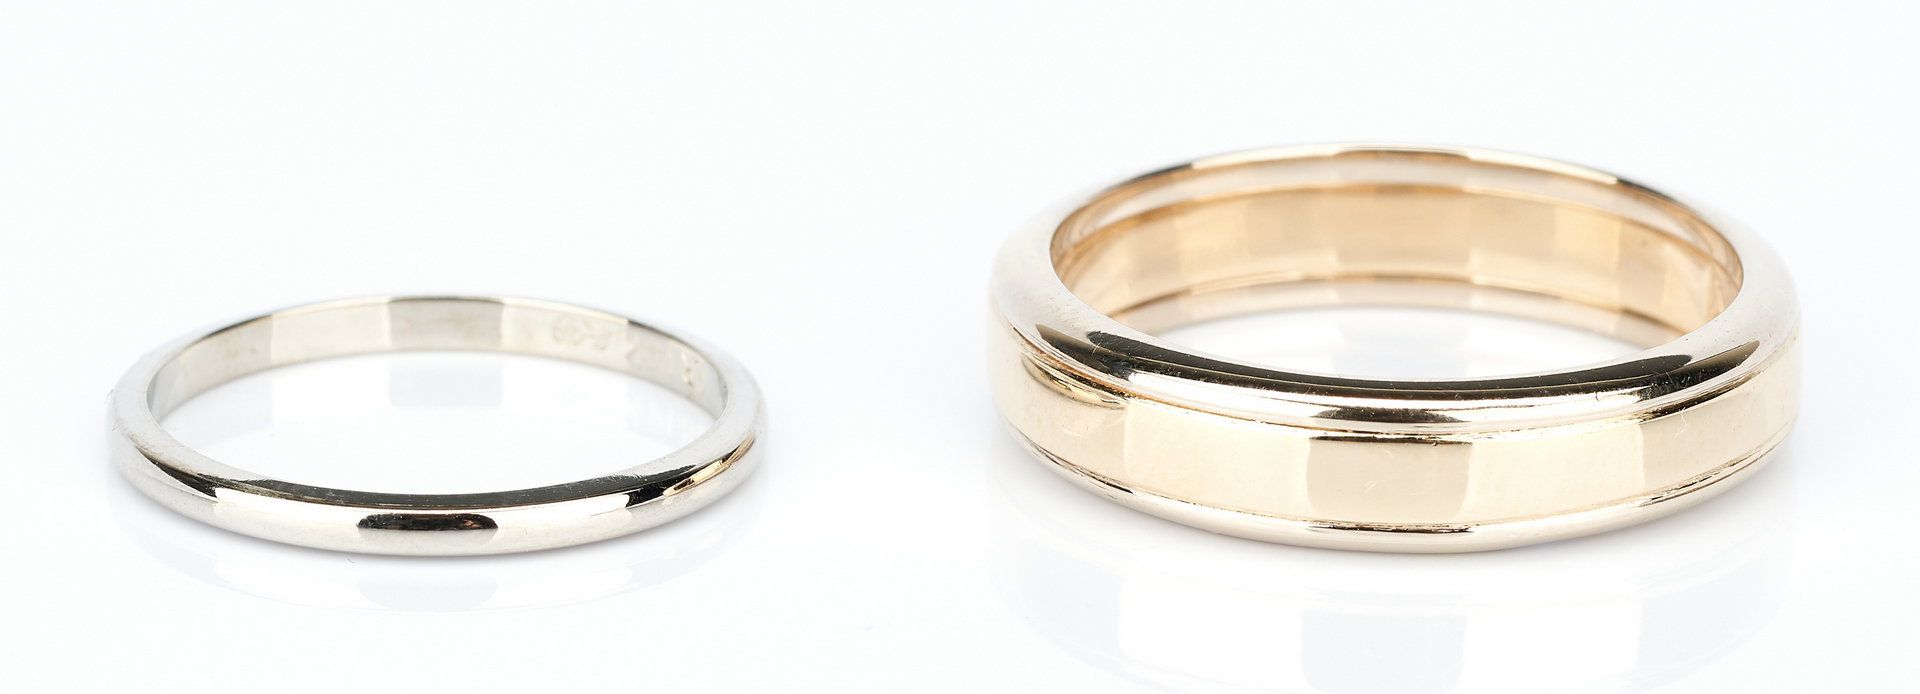 Lot 916: Three (3) 14K Wedding Bands